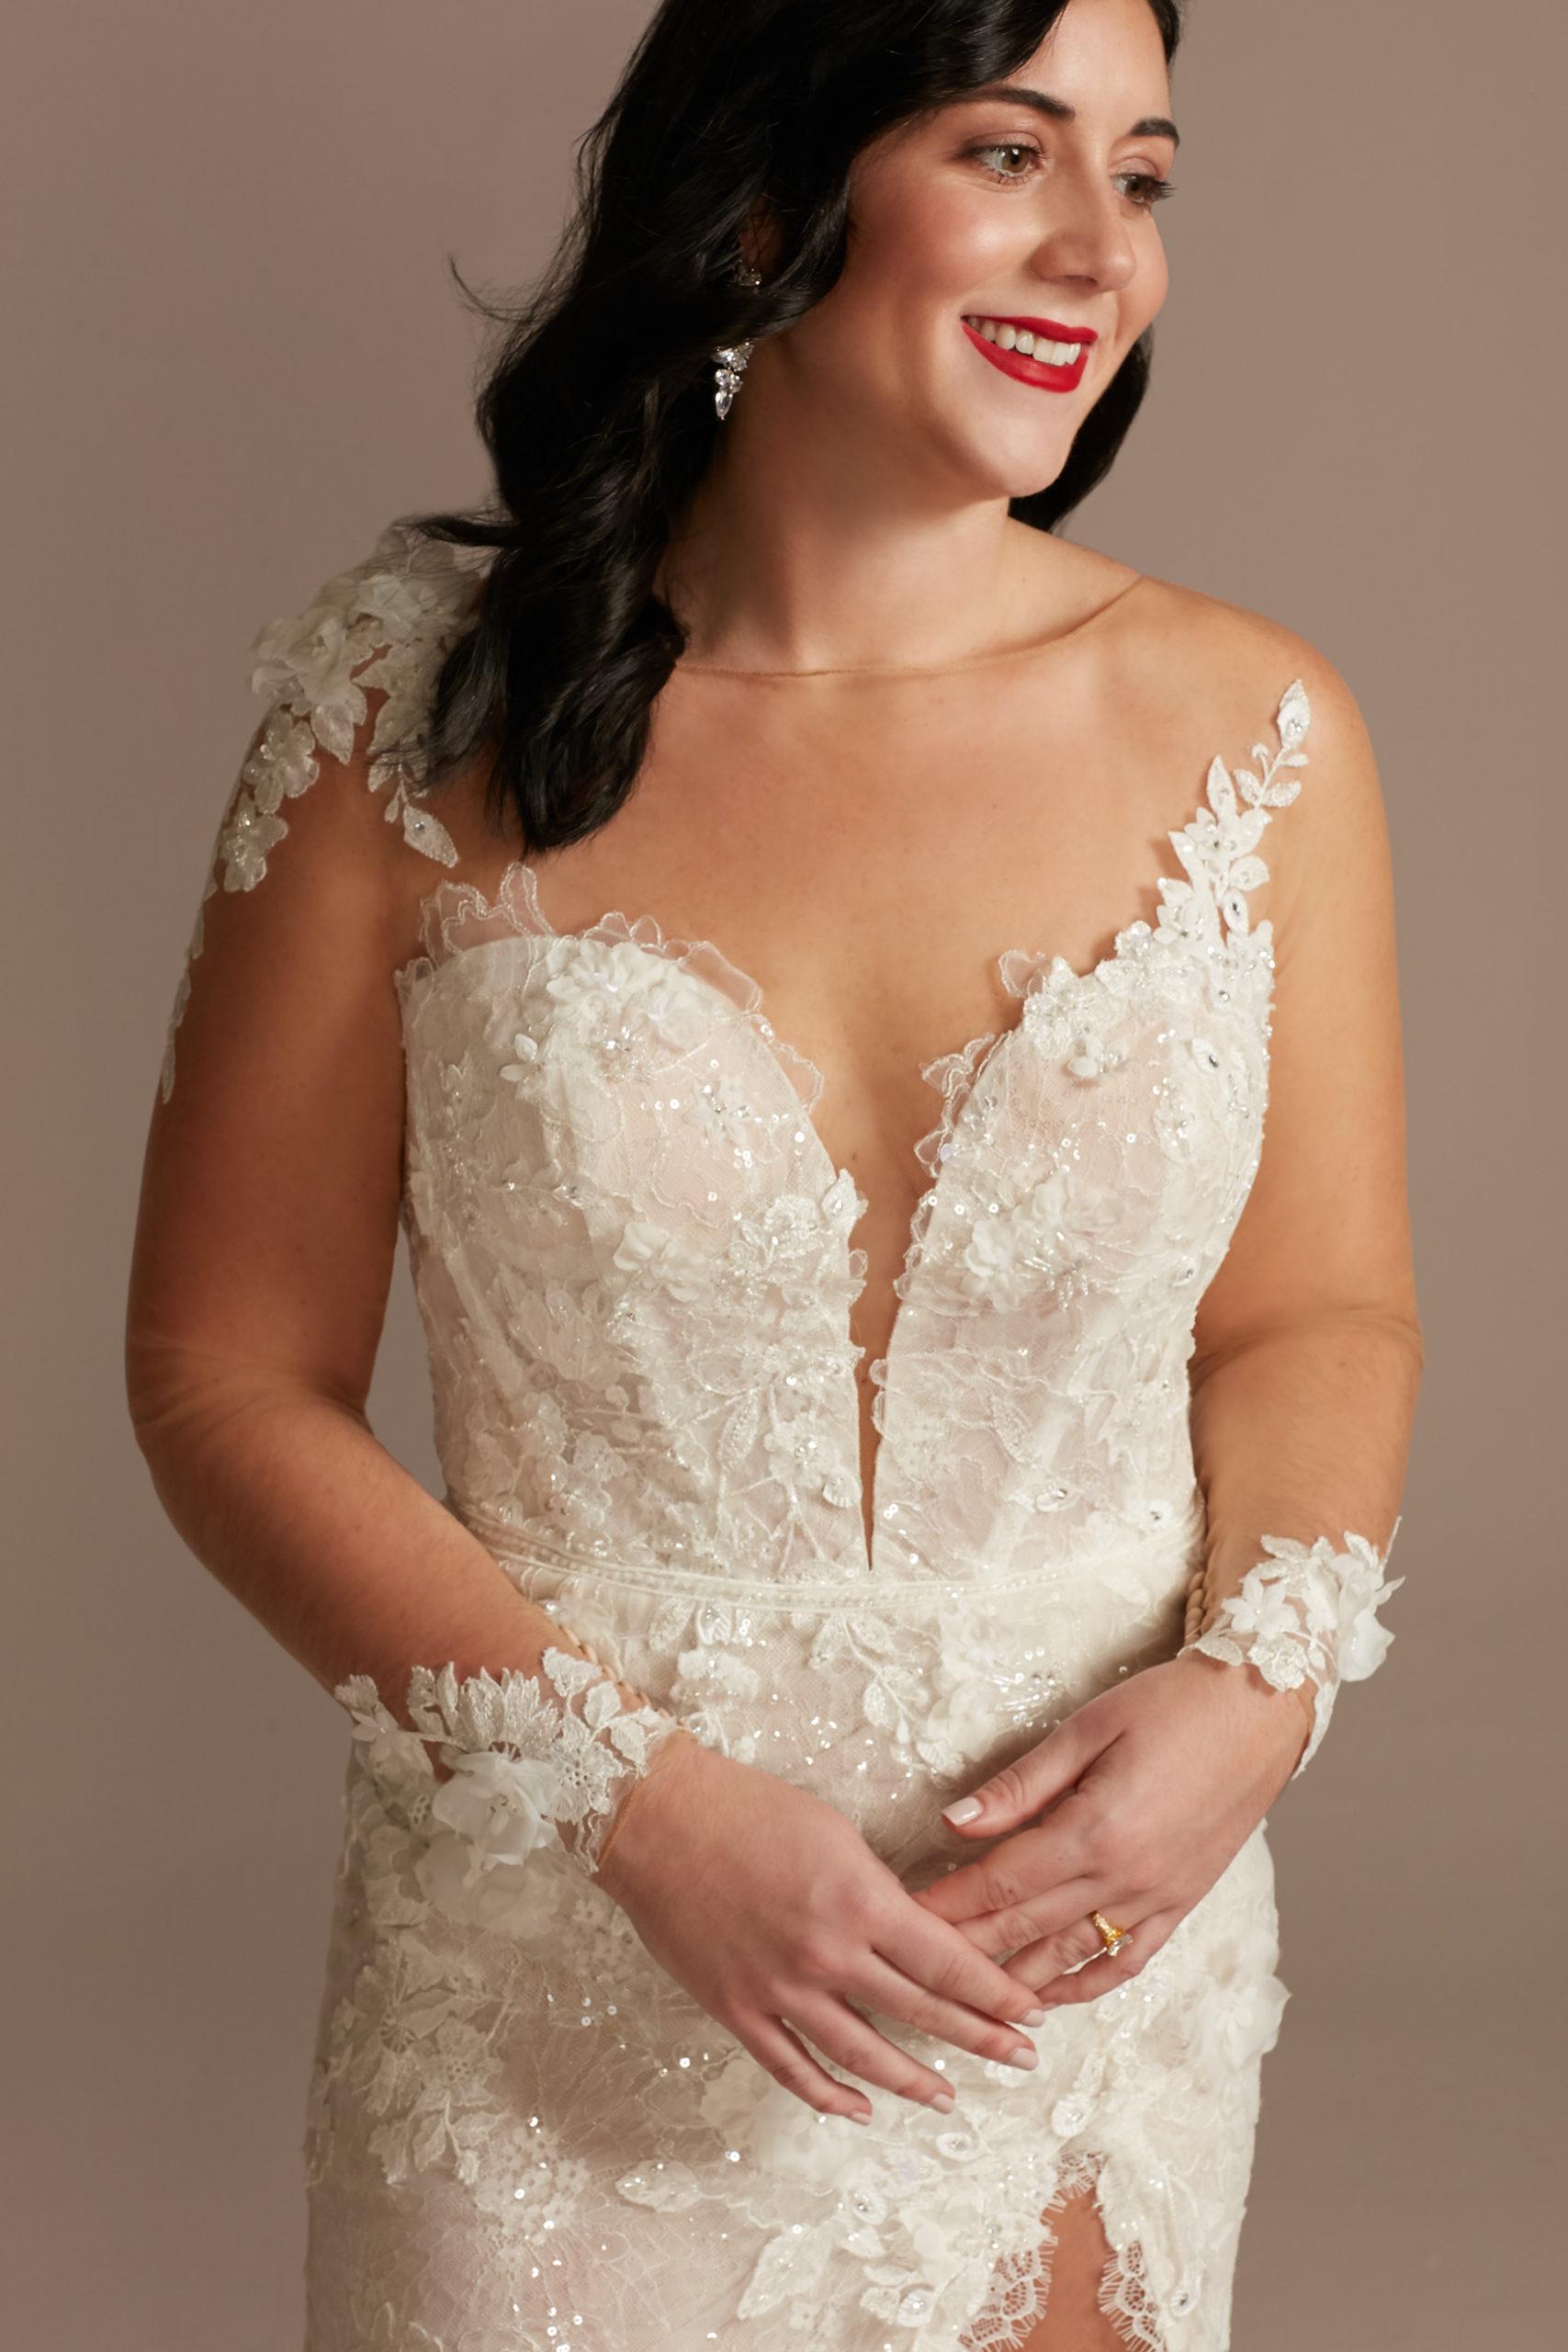 bride wearing ethereal 3D Floral Applique Wedding Dress with High Slit